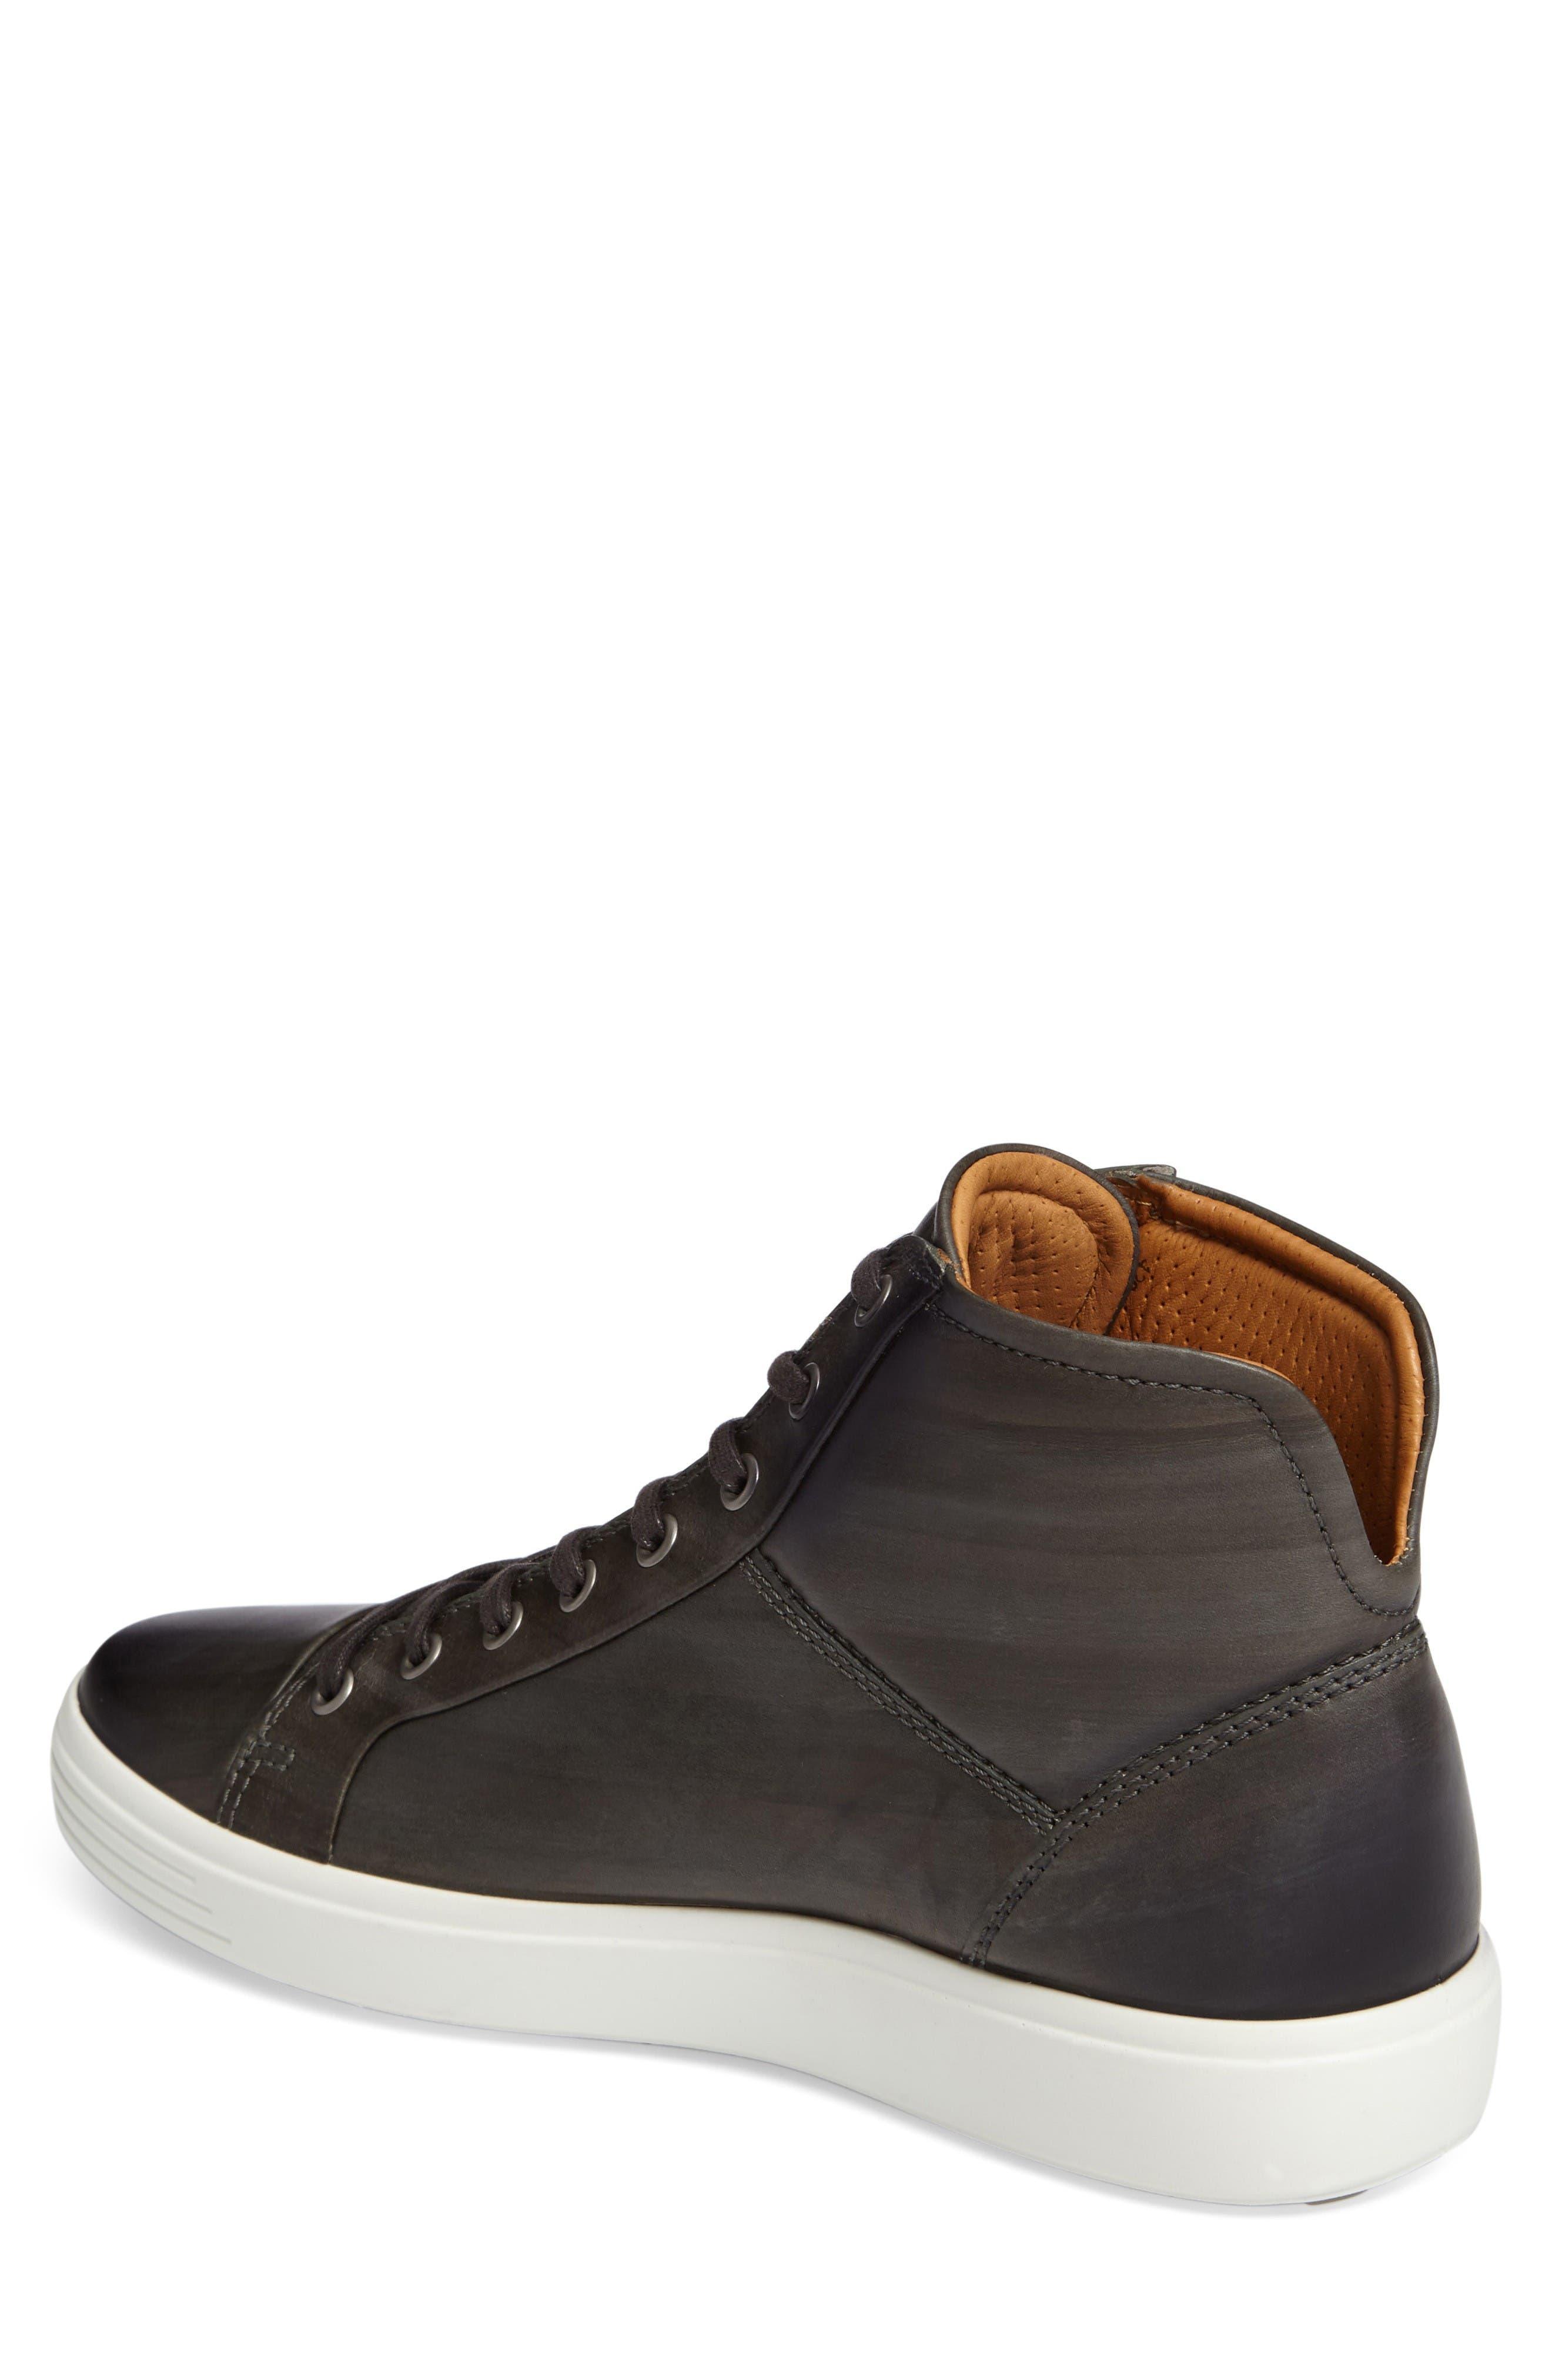 Alternate Image 2  - ECCO Soft 7 High Top Sneaker (Men)